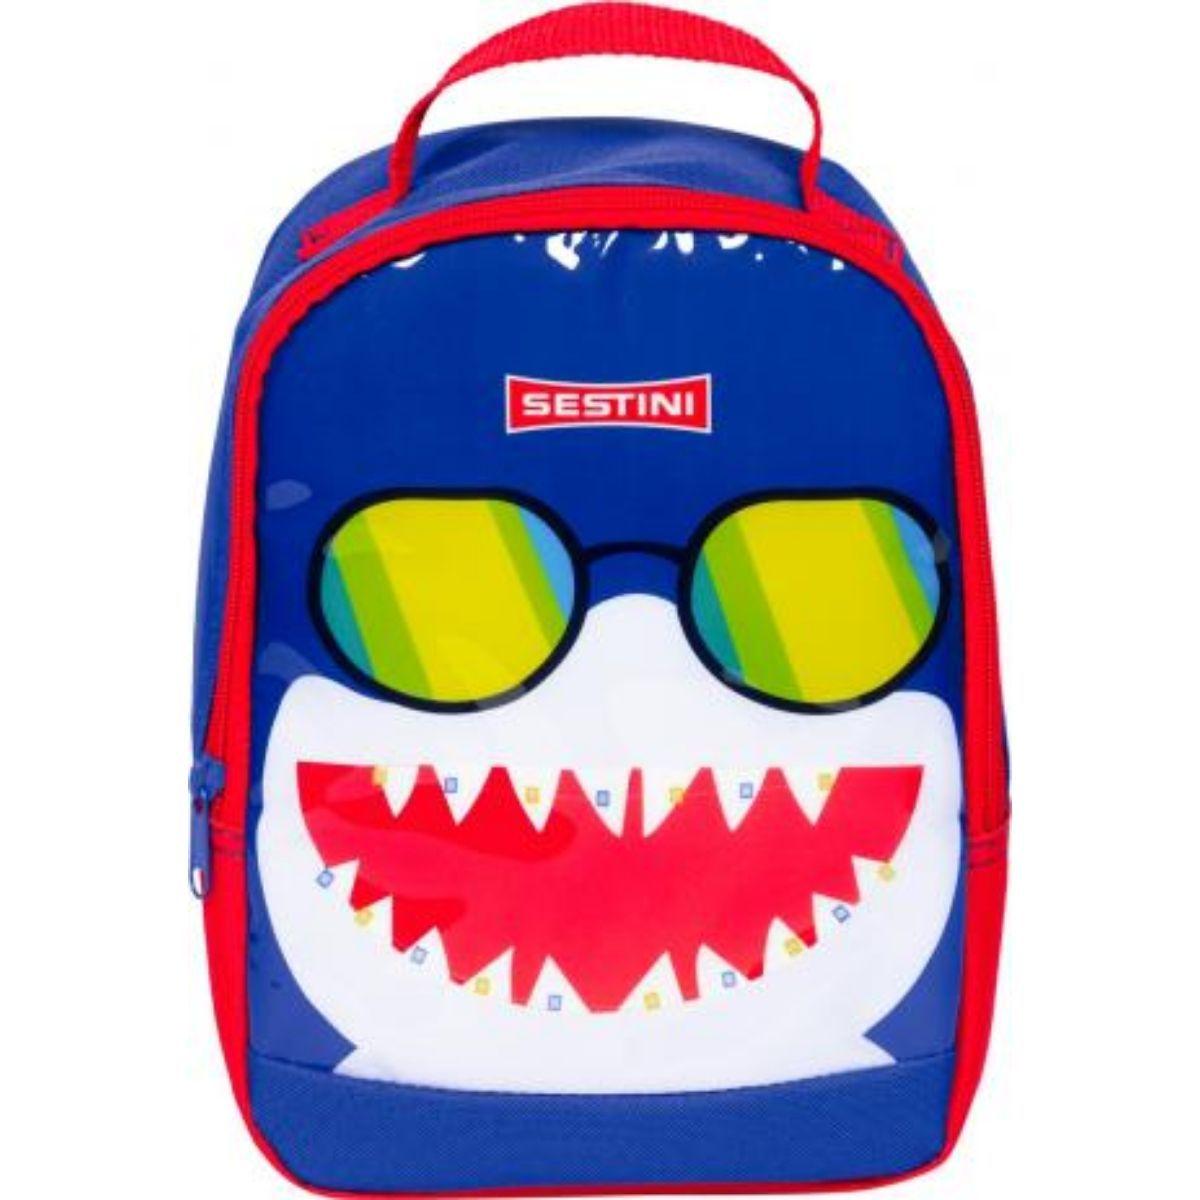 Lancheira Infantil Escolar Basic Tubarão Sestini - 065608-00